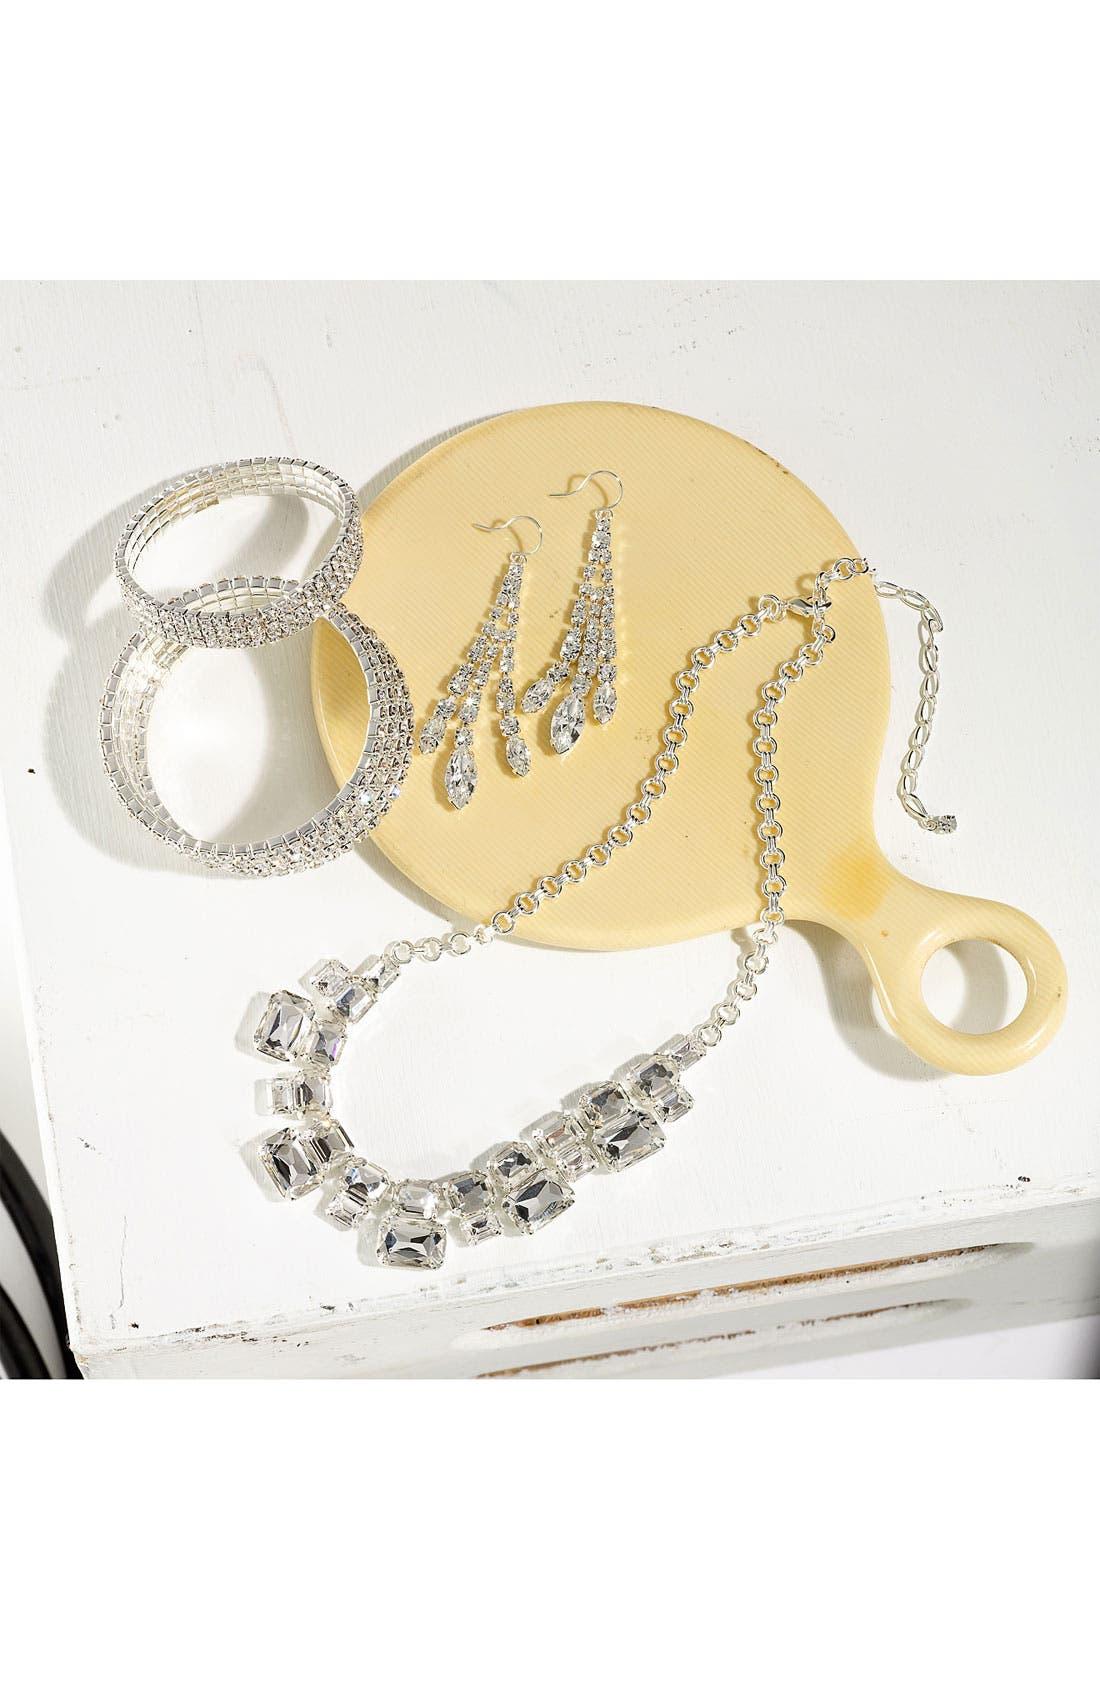 Jewelry Bib Necklace,                             Alternate thumbnail 3, color,                             040